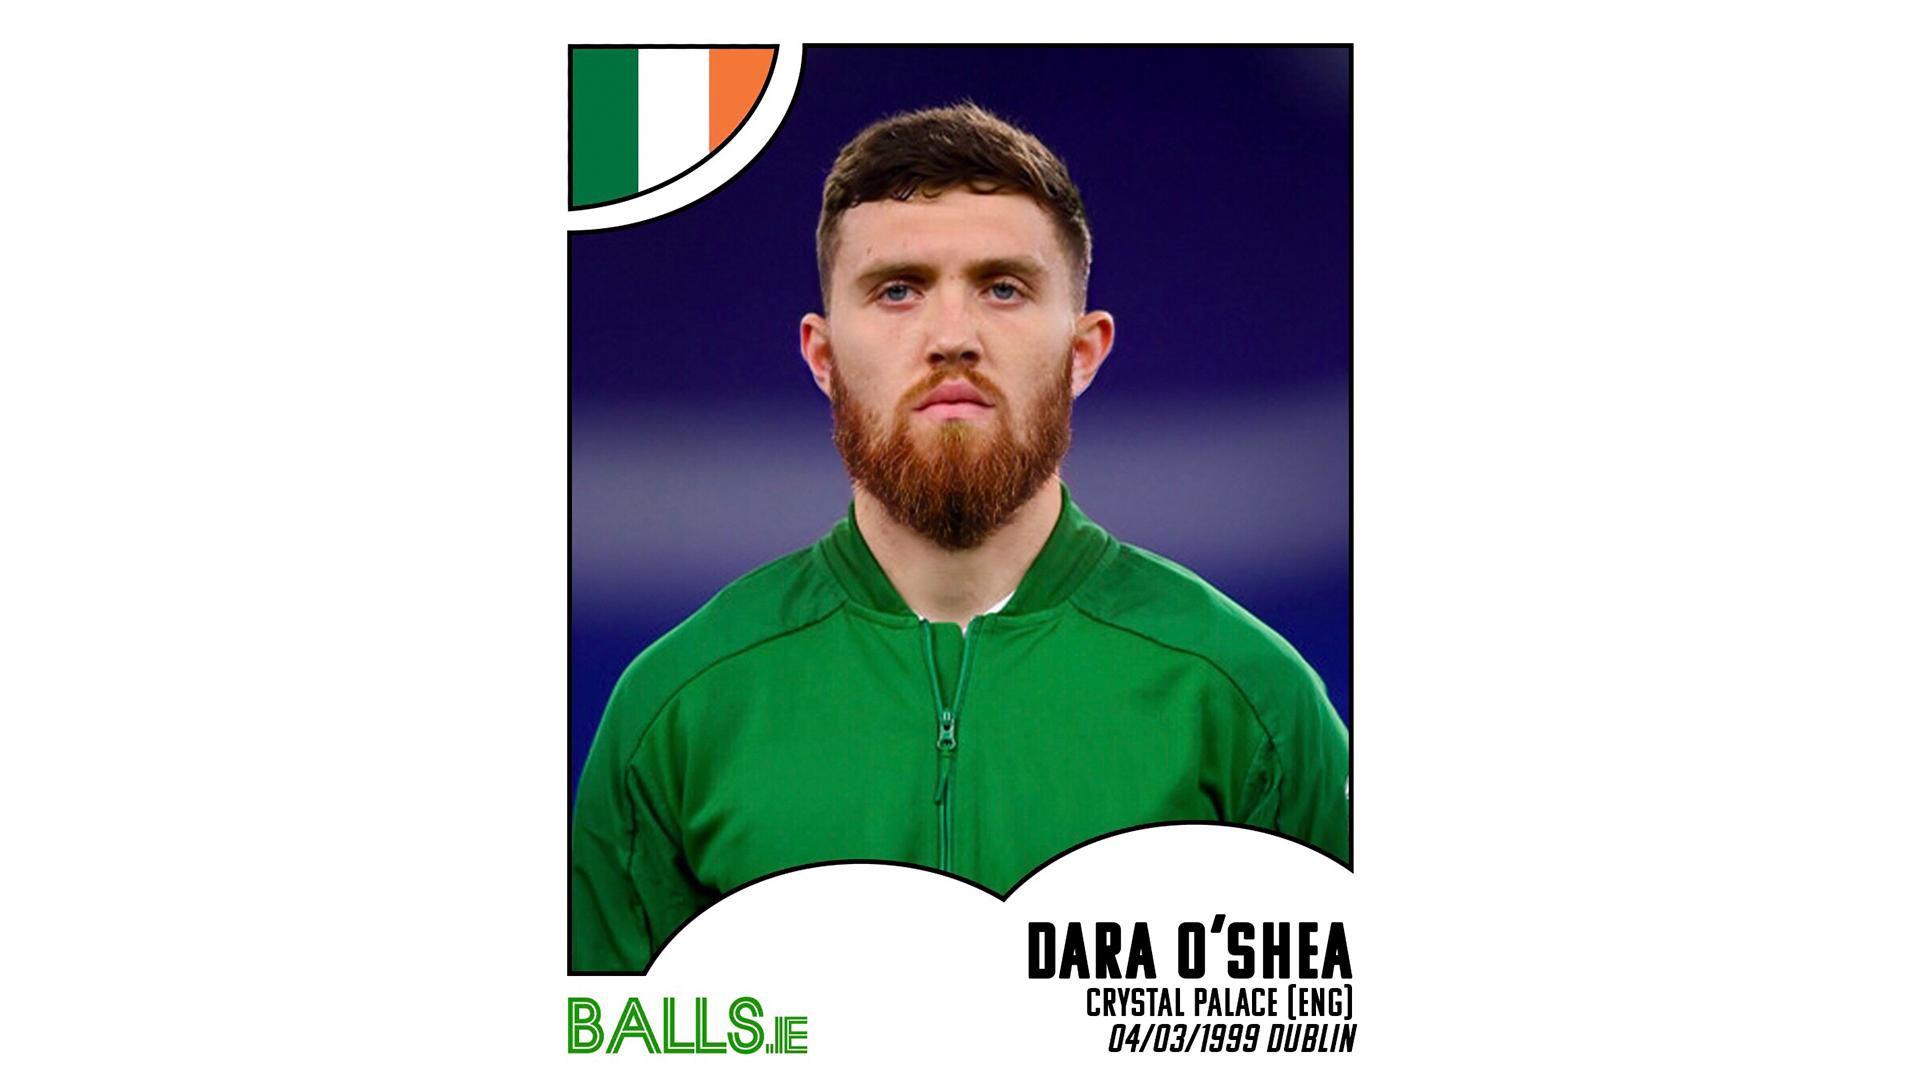 Dara O'Shea 2030